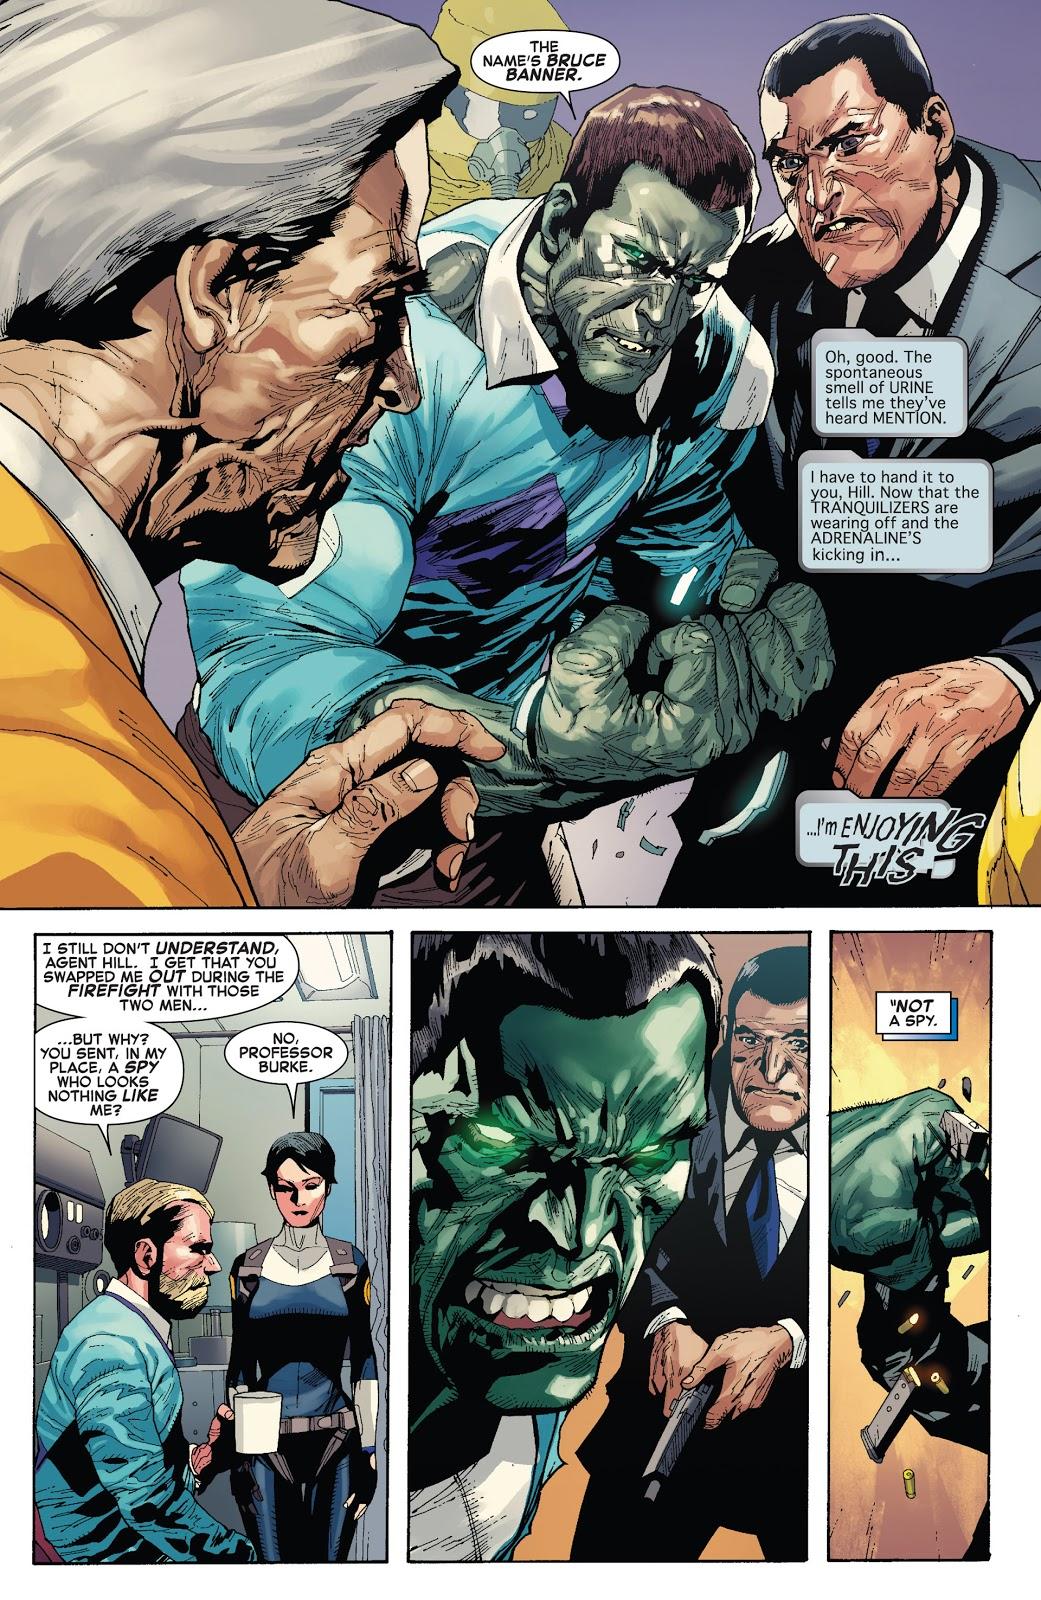 Indestructible Hulk 1 Agent of S.H.I.E.L.D. review